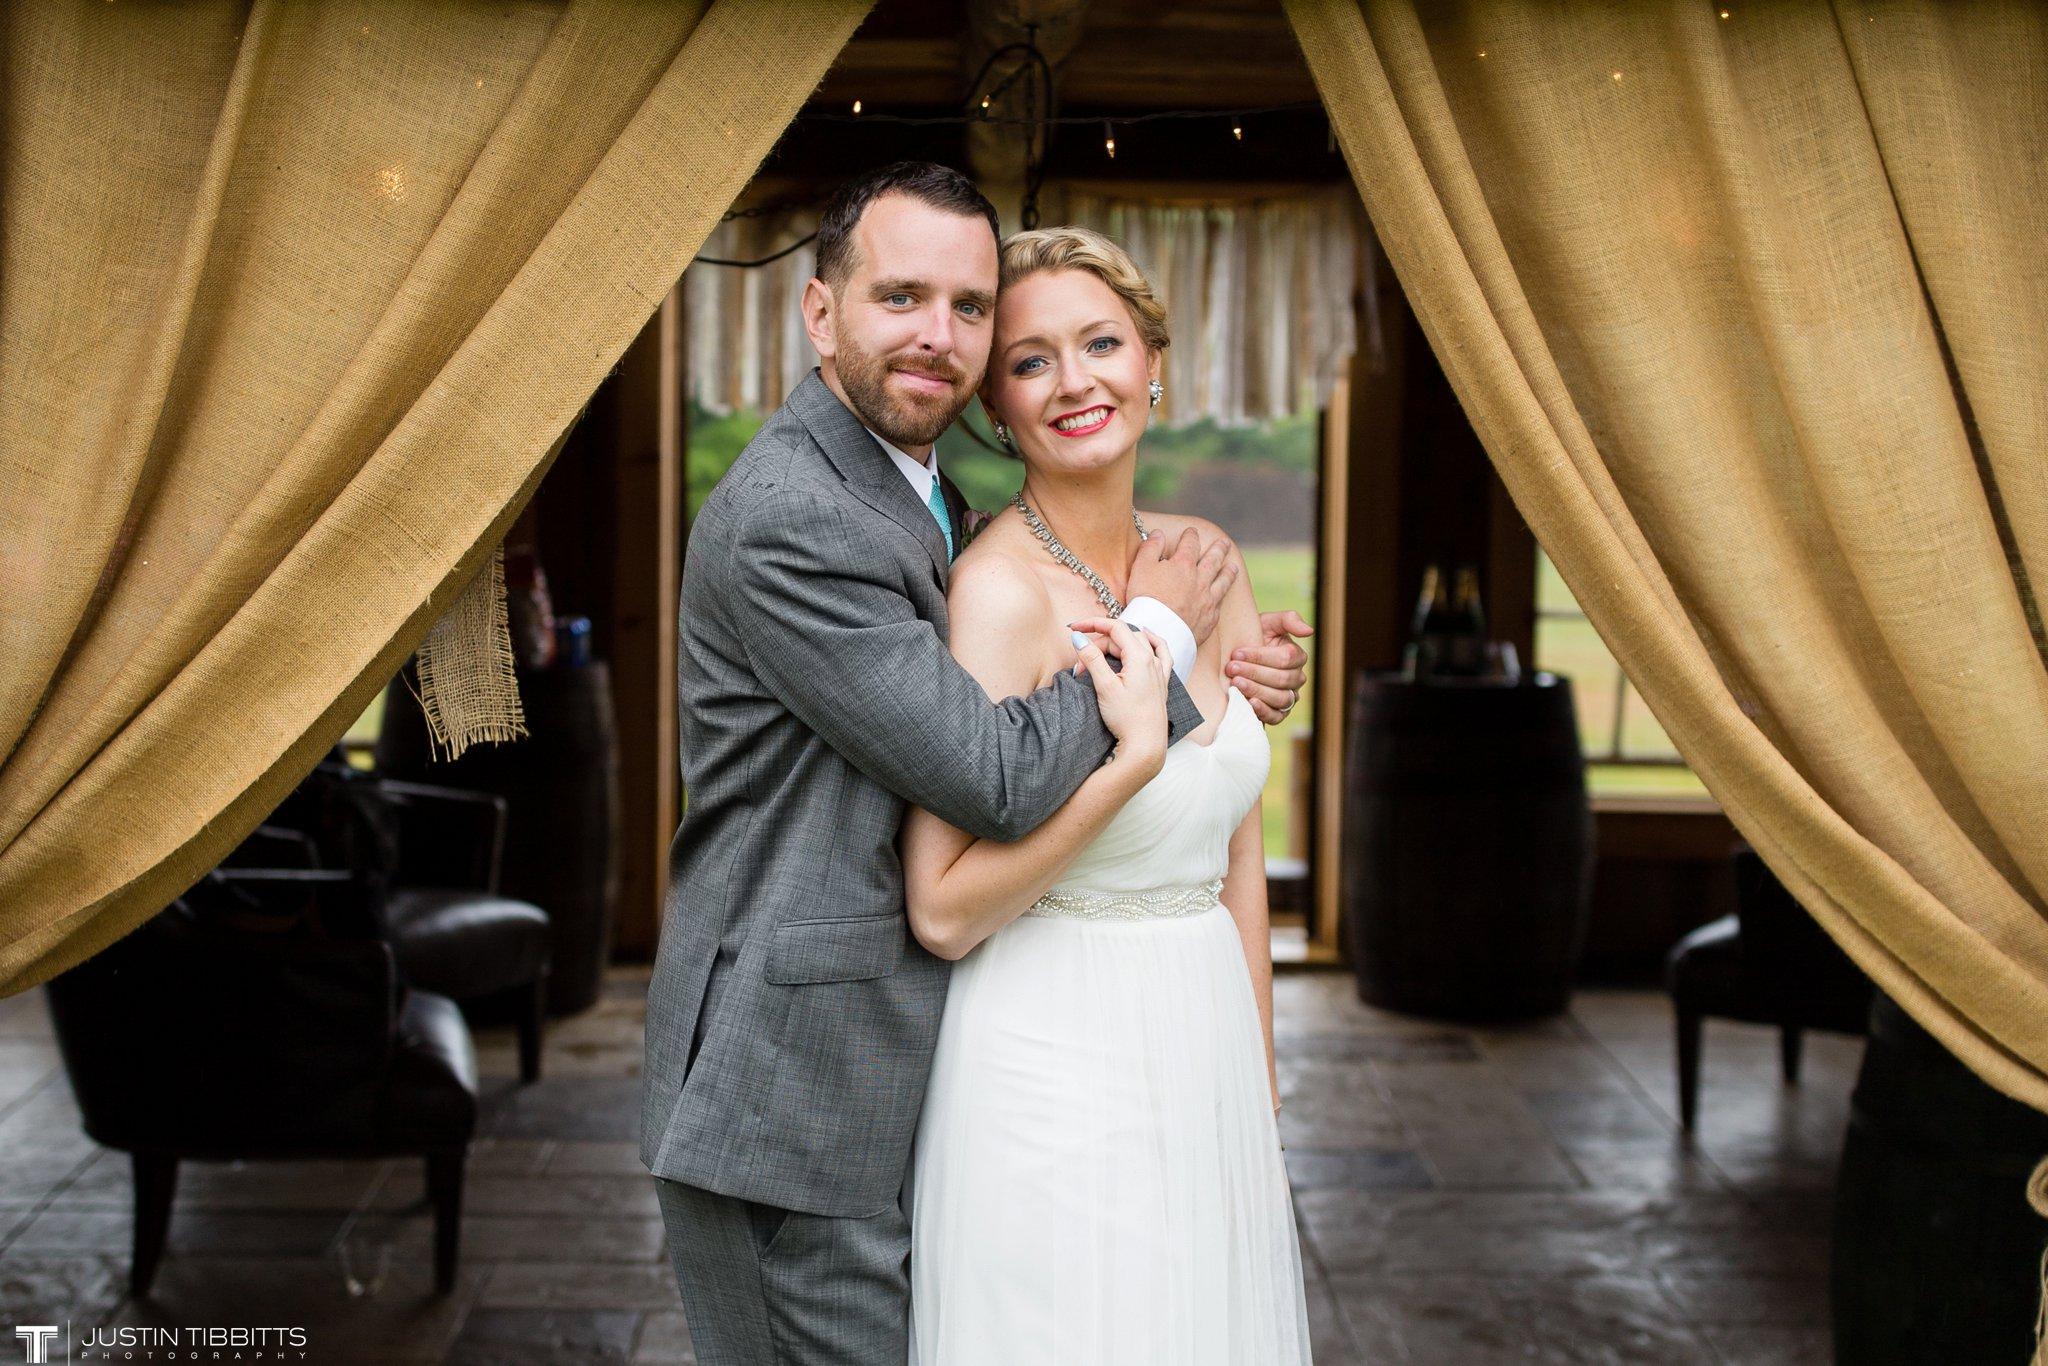 burlap-and-beams-wedding-photos-with-joran-and-molly_0091